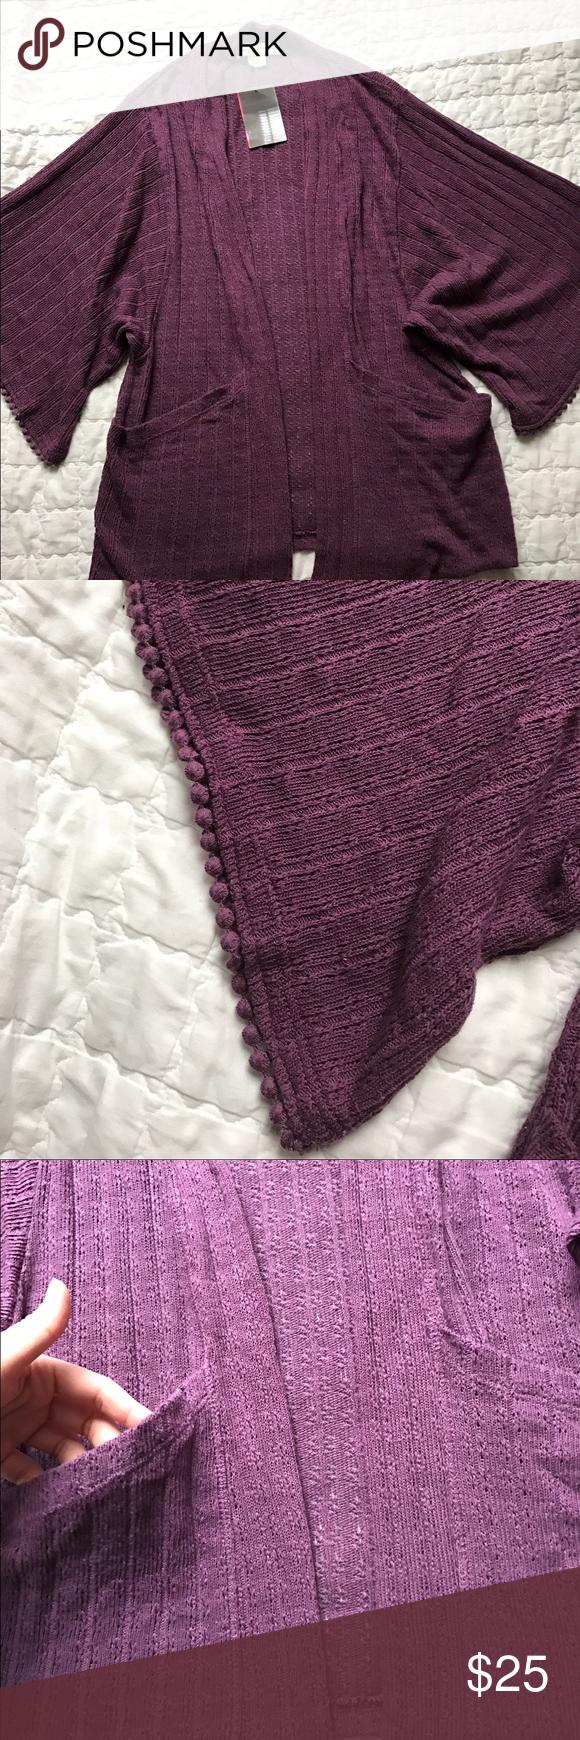 Deep purple cardigan NWT | Deep purple, Urban outfitters sweaters ...